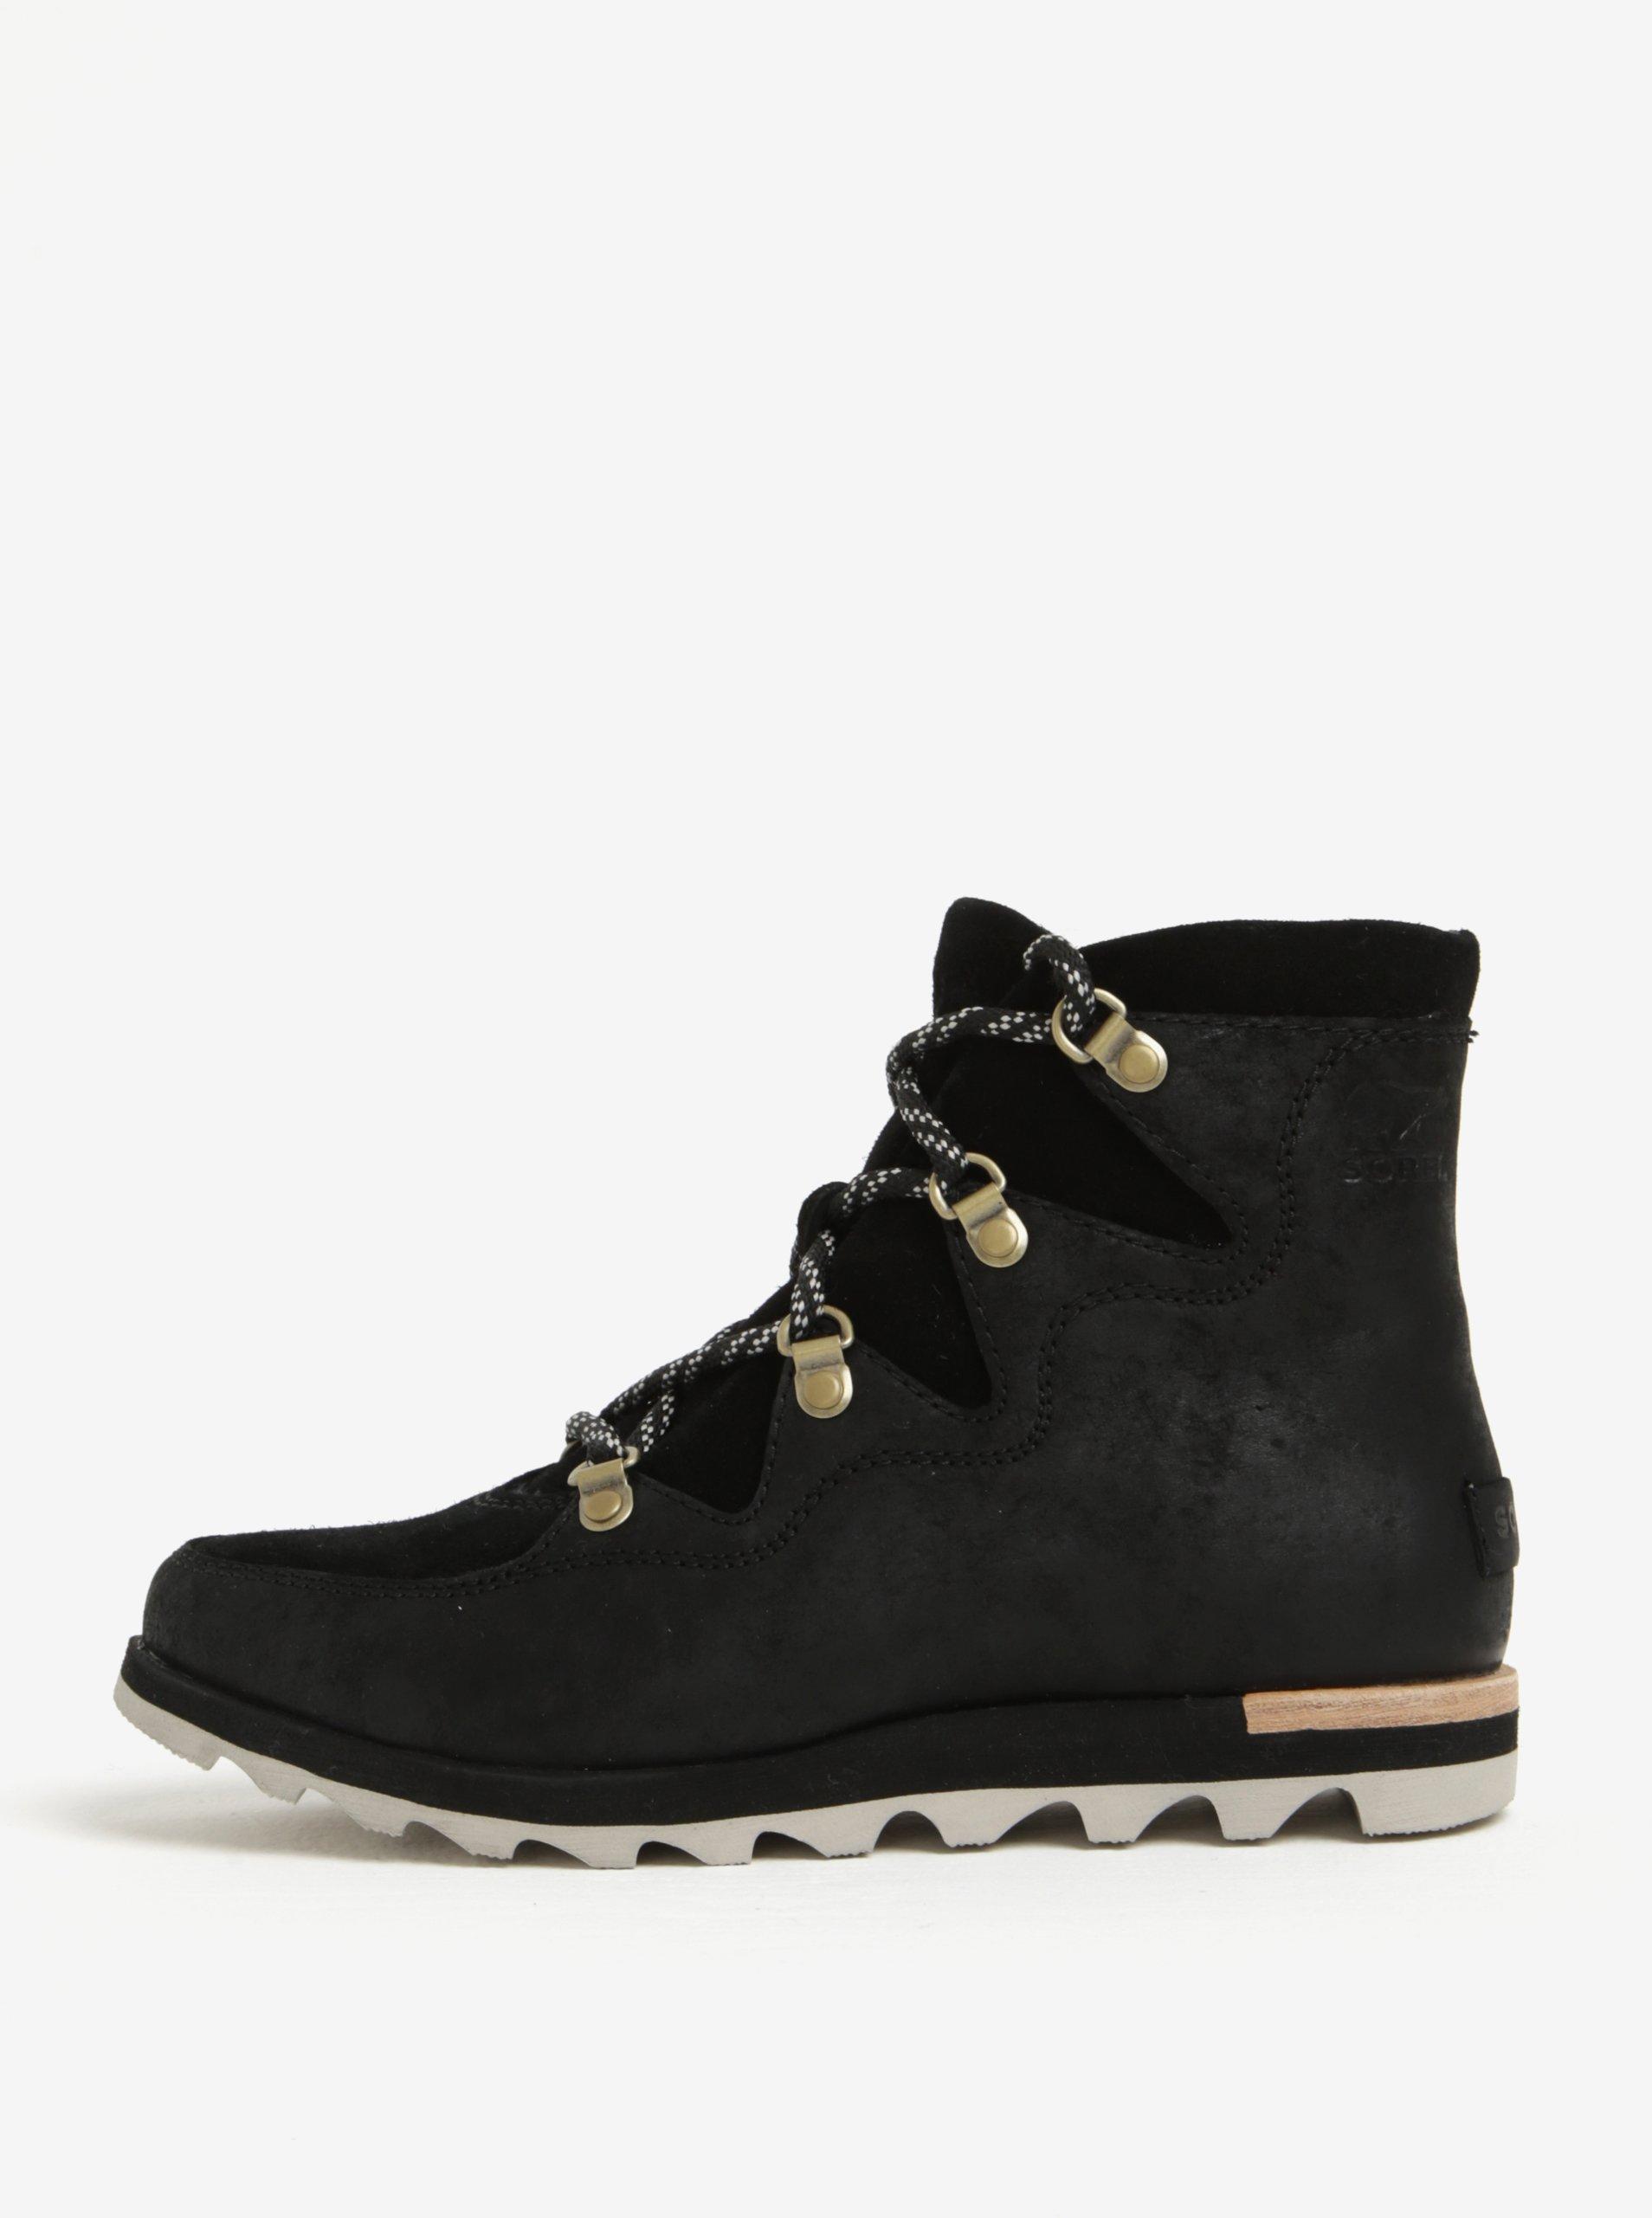 7b63a9561d Čierne dámske členkové kožené vodovzdorné zimné topánky SOREL